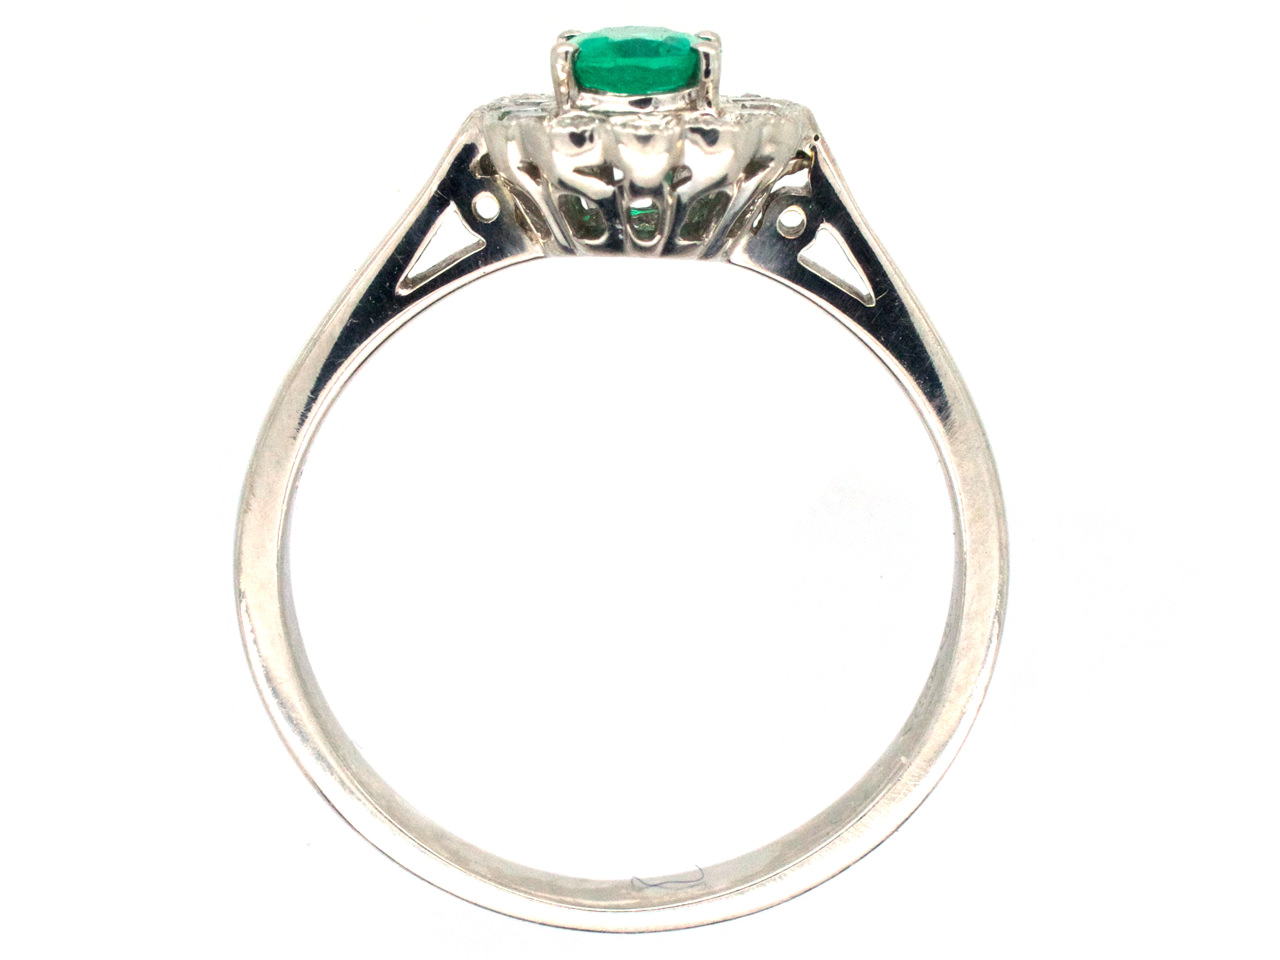 Emerald & Diamond Oval Cluster Ring